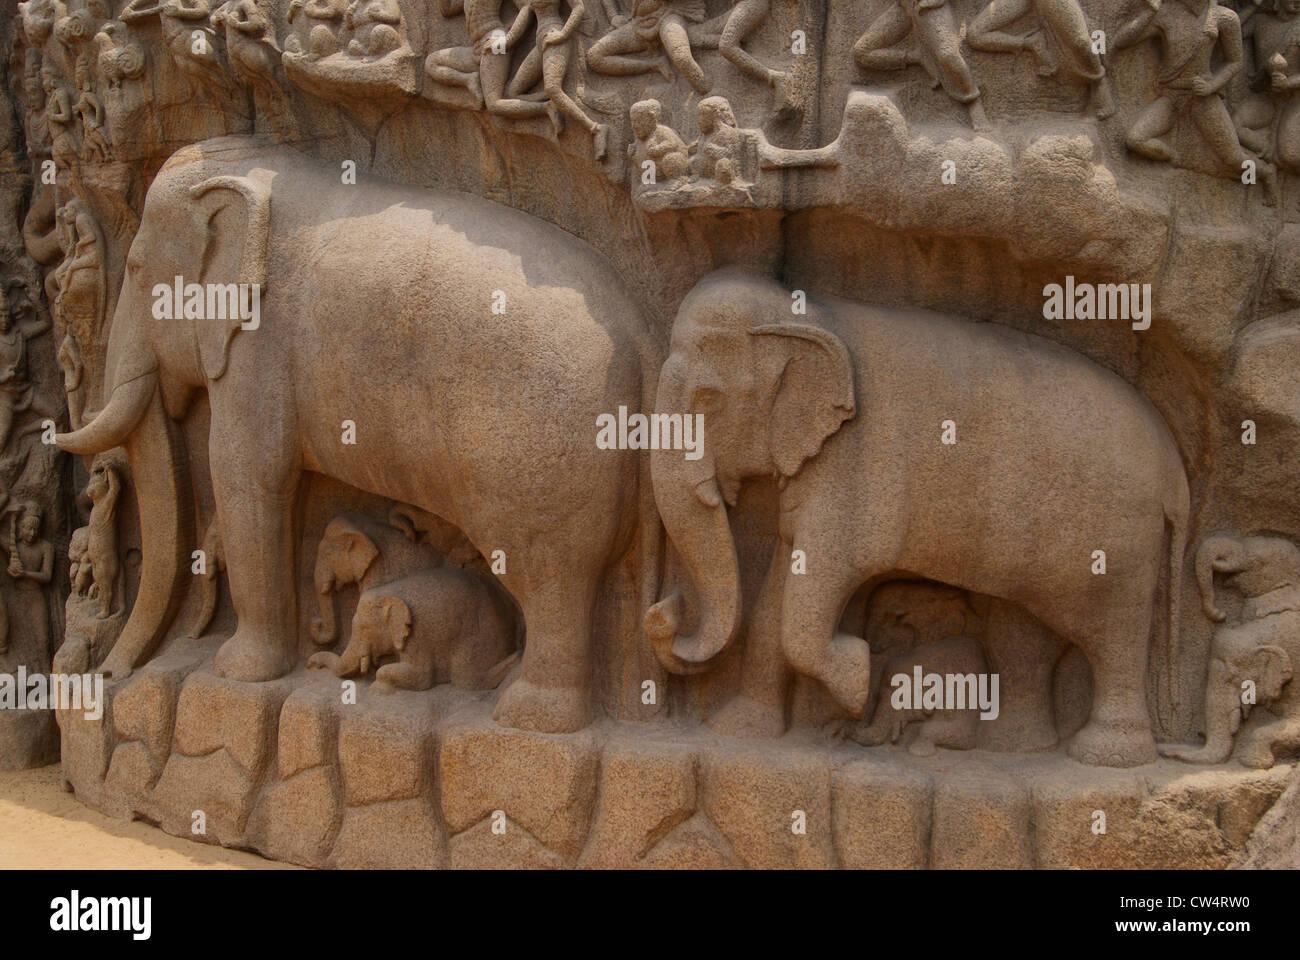 India elephants sculptures stock photos